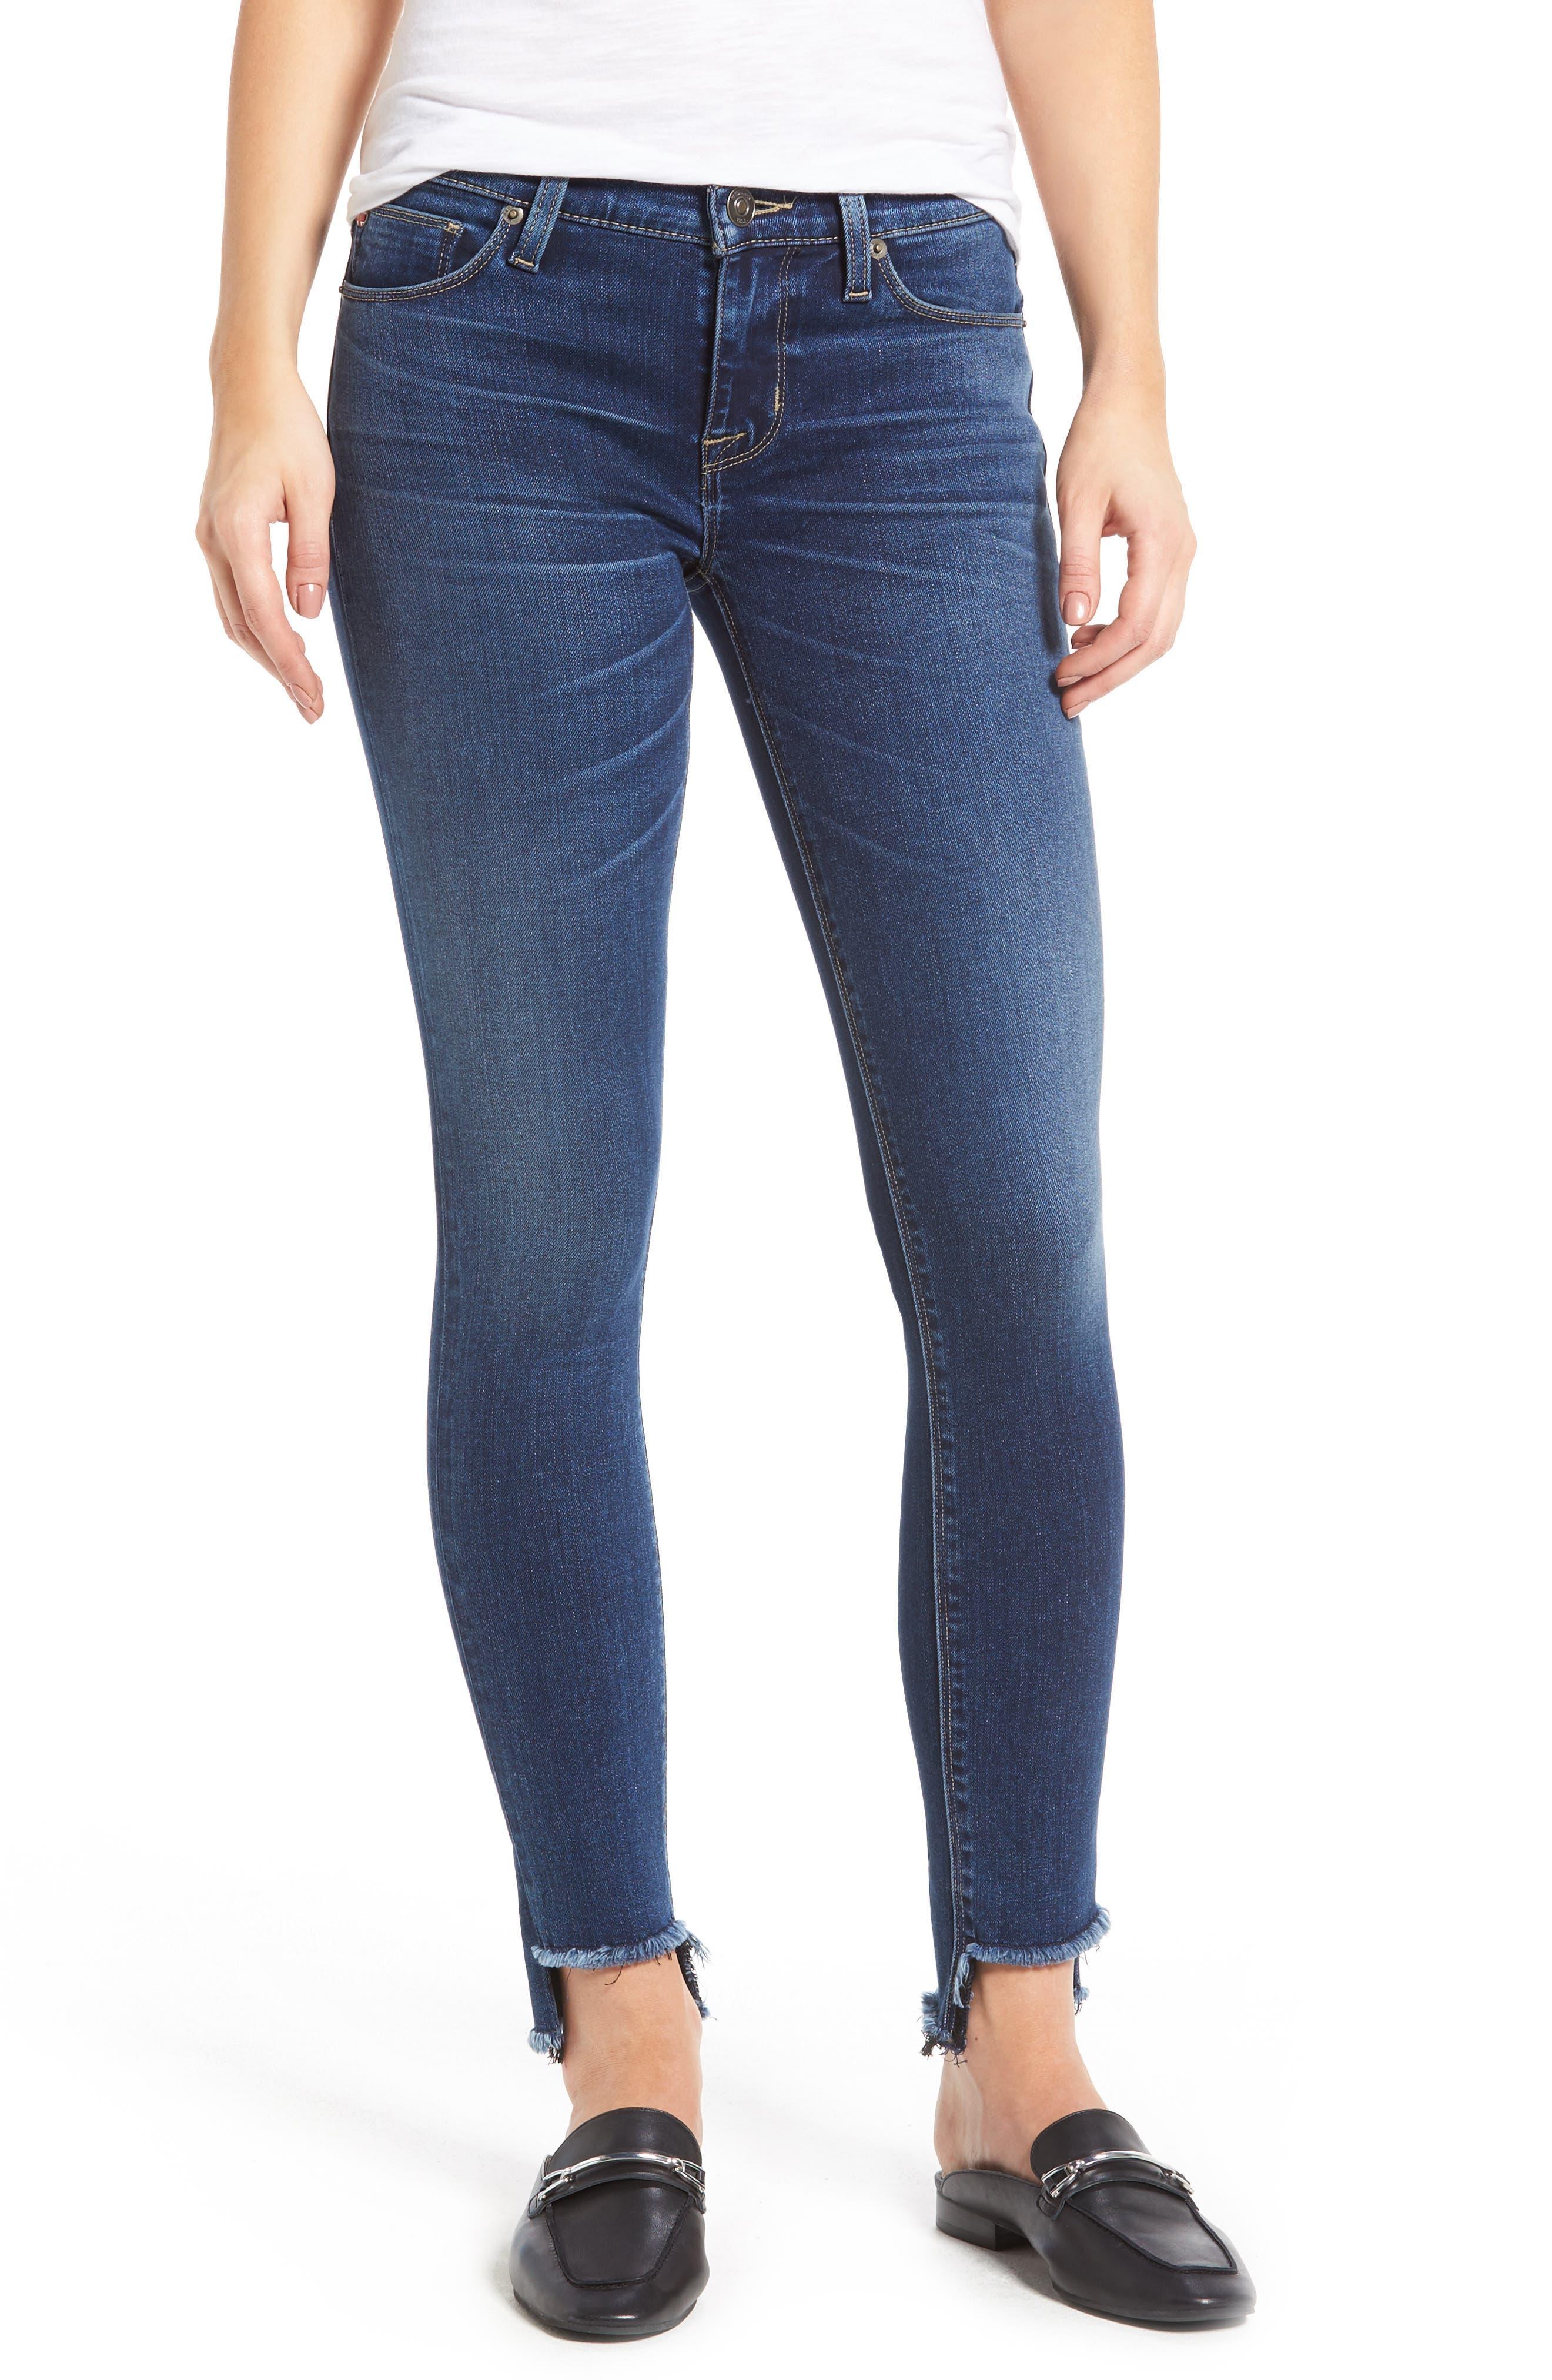 Alternate Image 1 Selected - Hudson Jeans Colette Step Hem Skinny Jeans (Backbone)